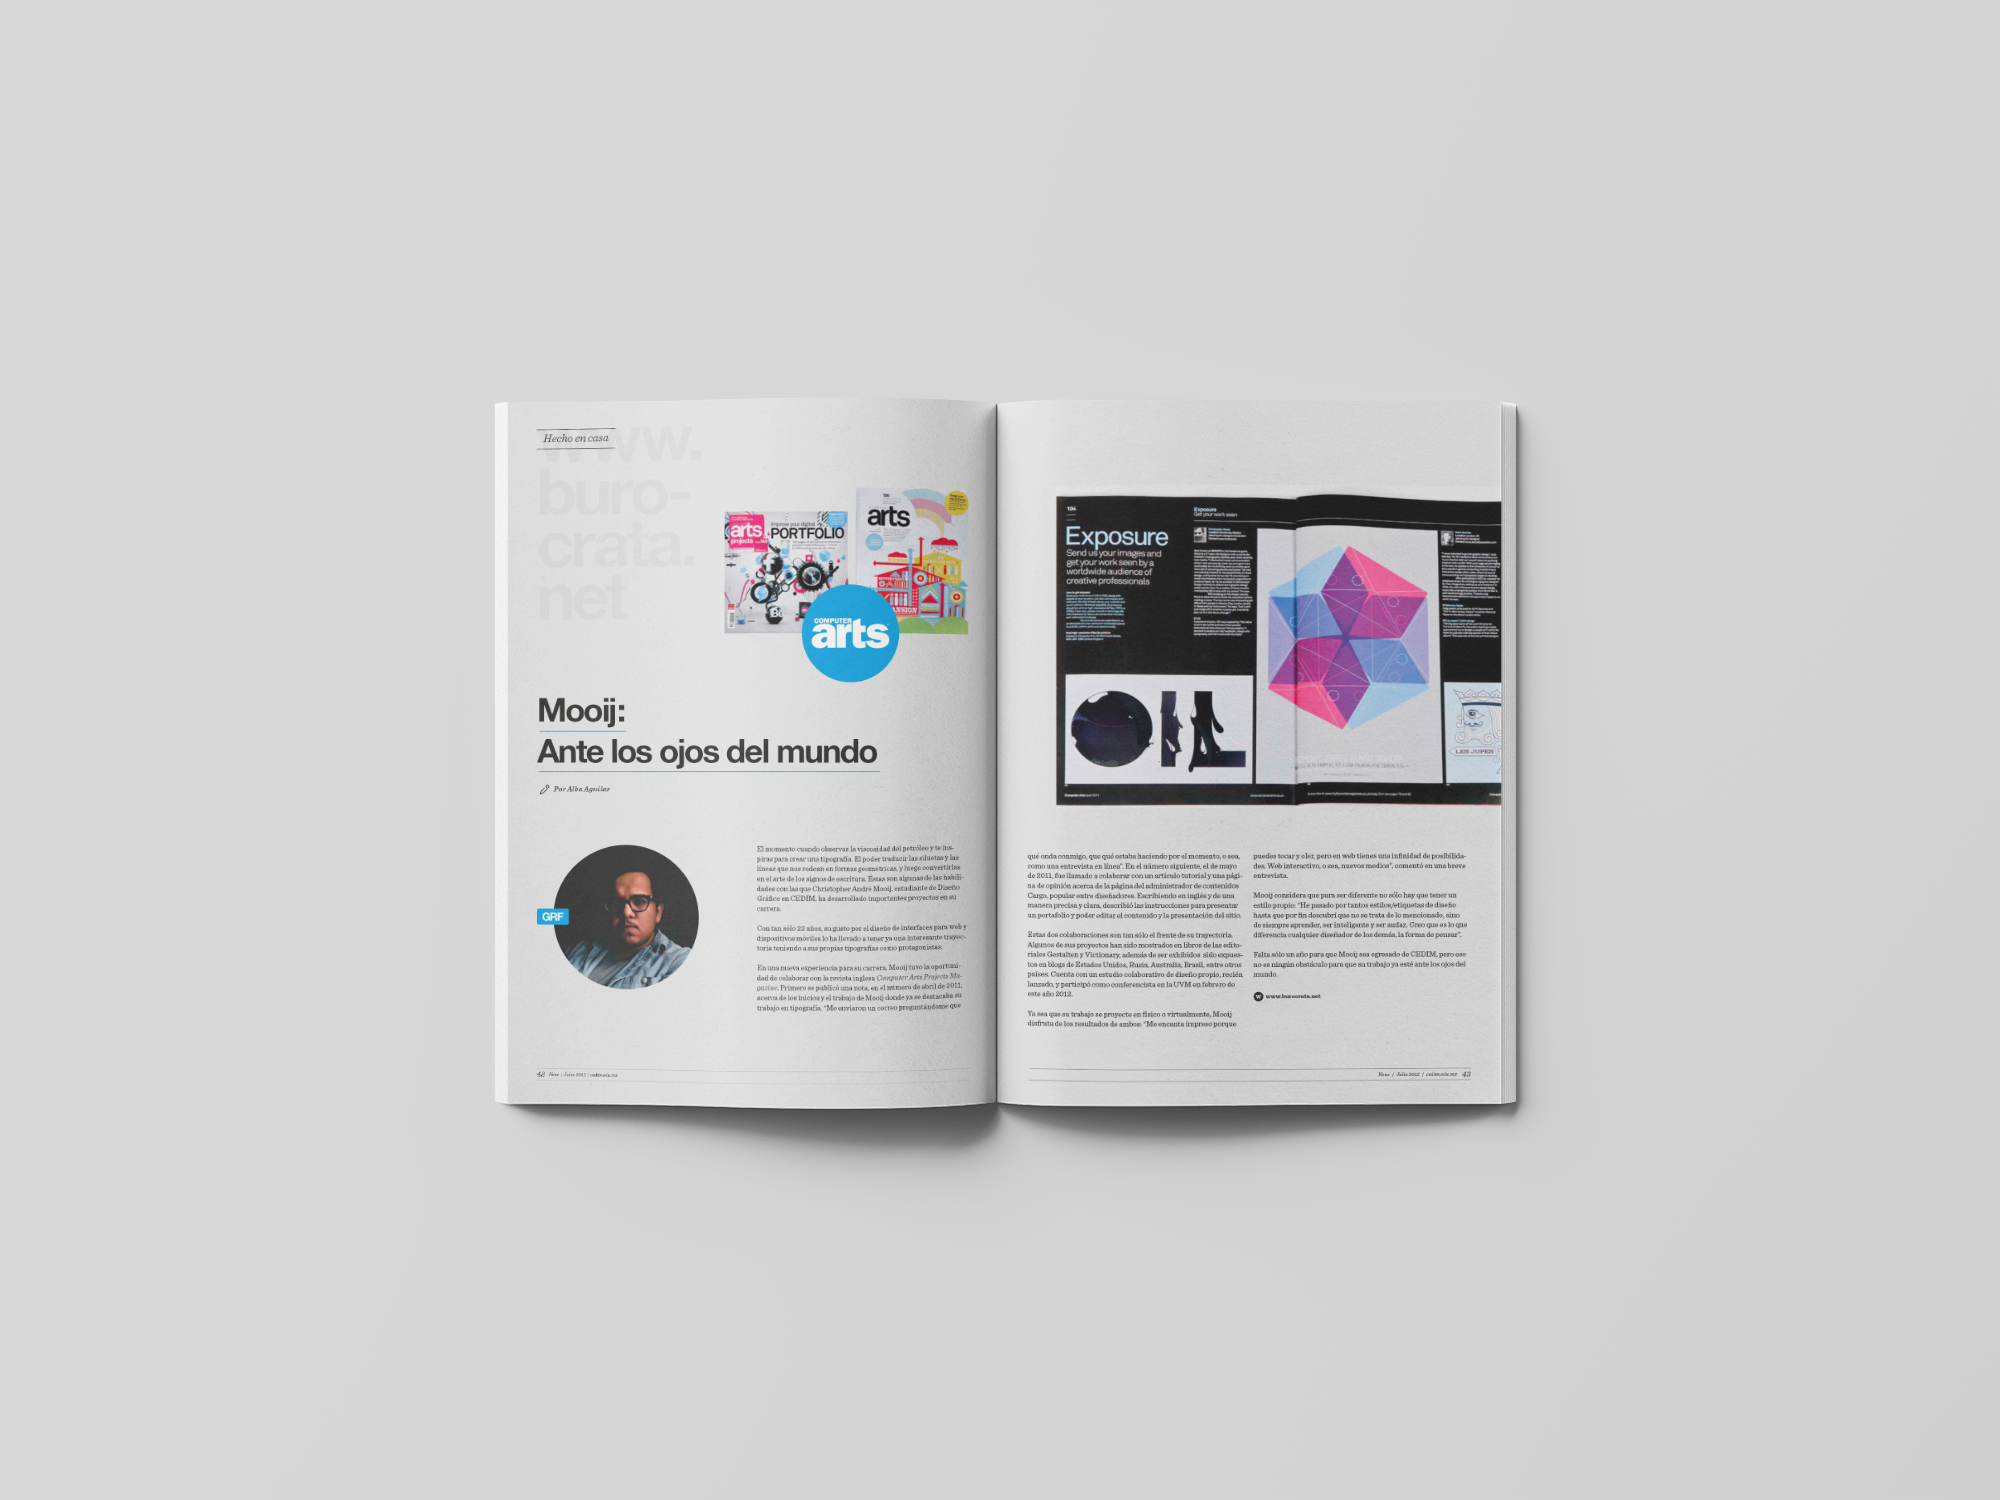 spread15-neue02-magazine-cedim-yoenpaperland